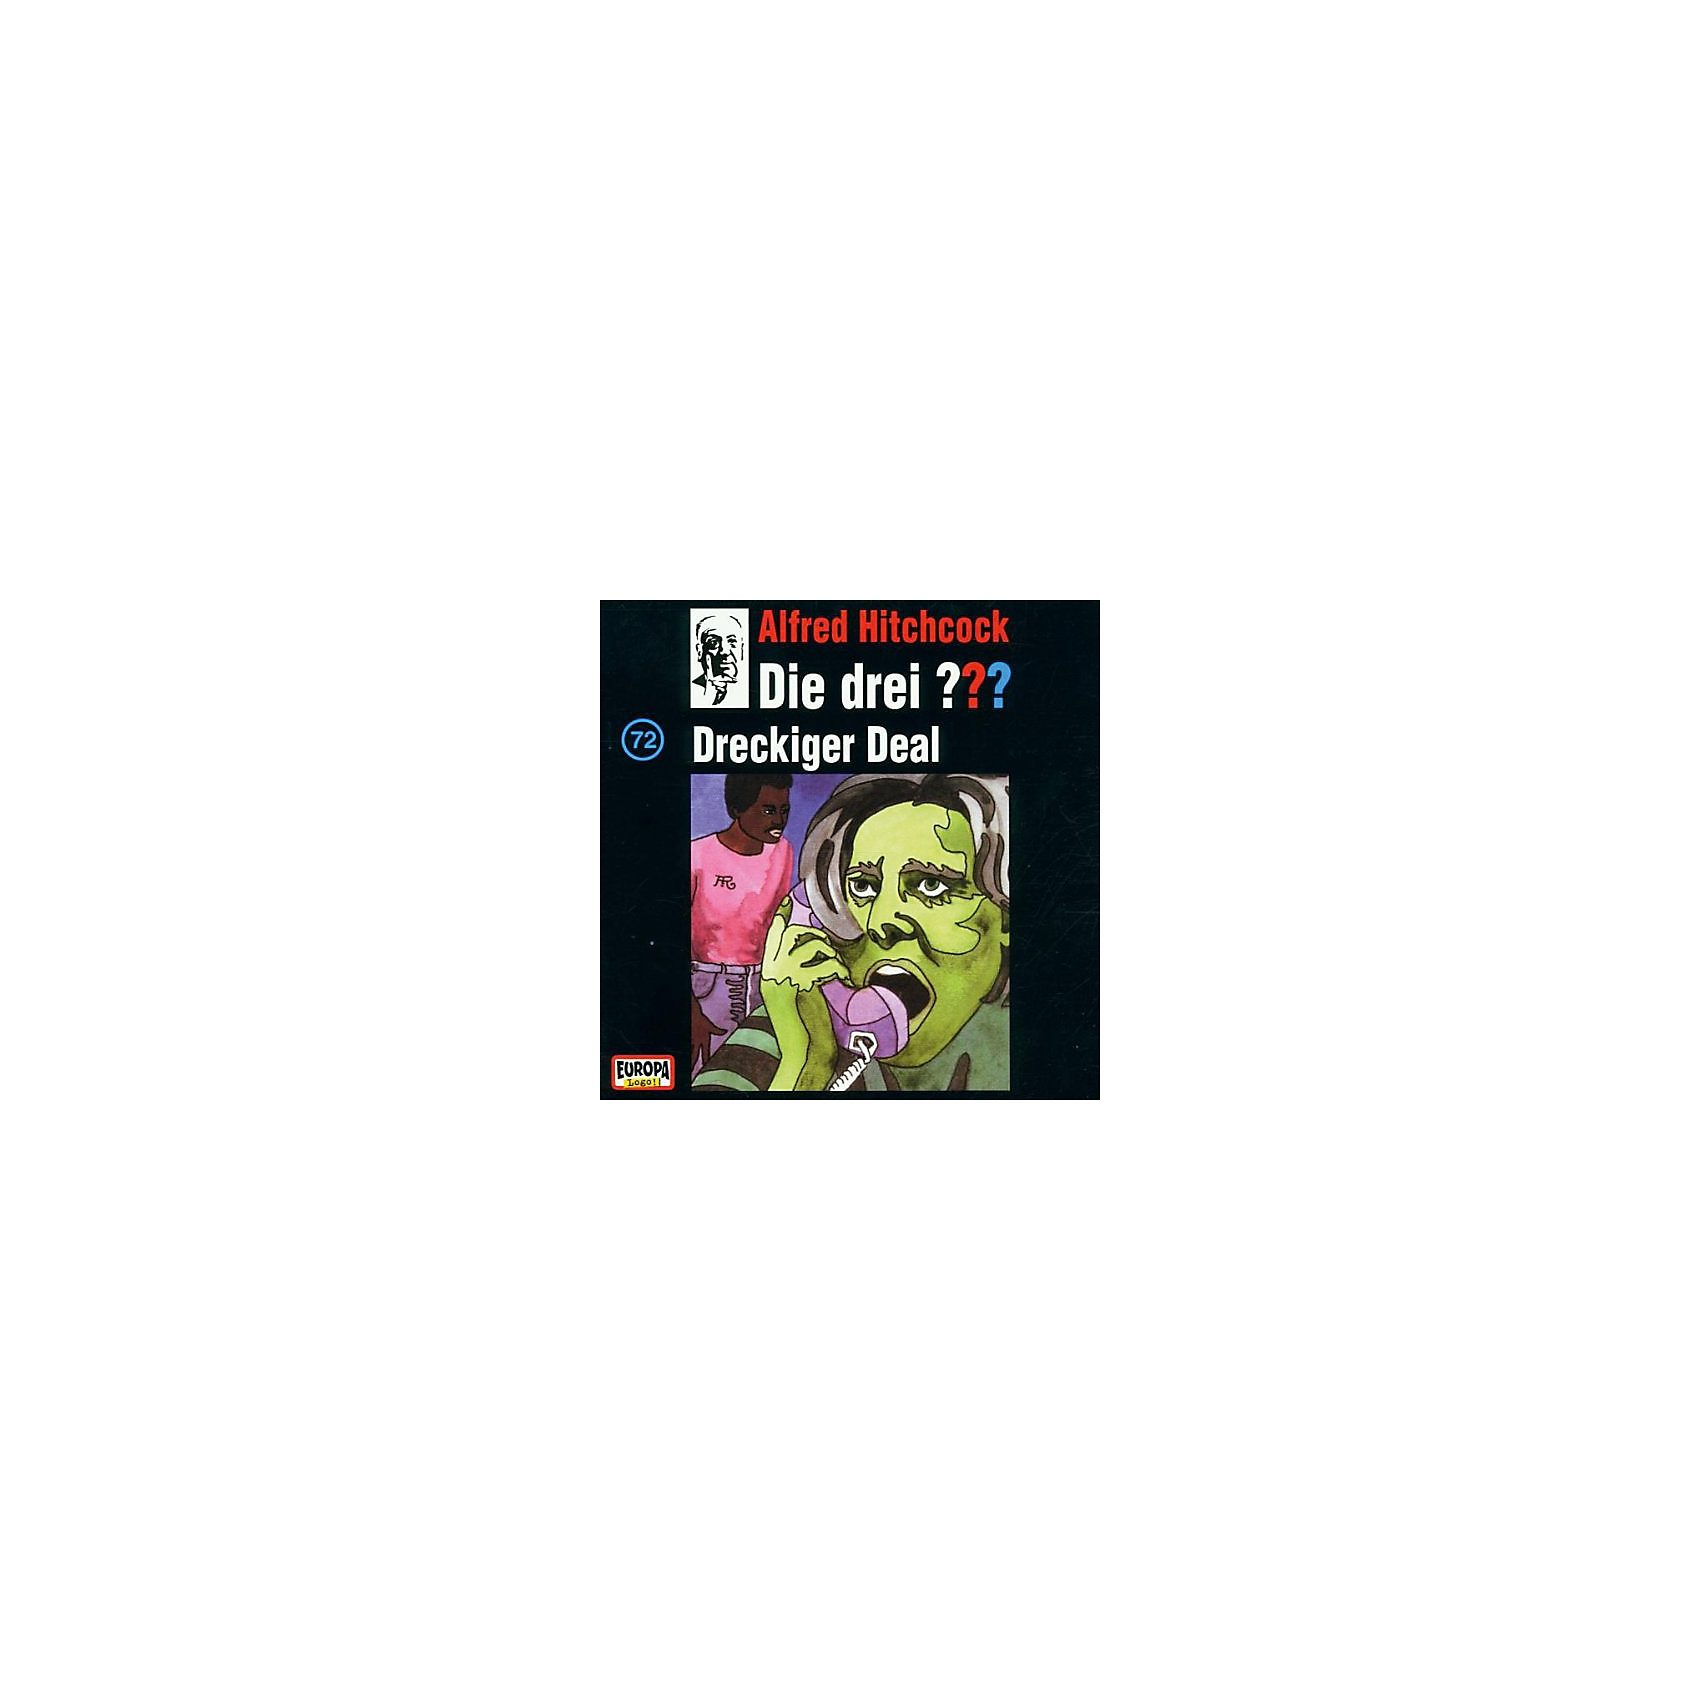 SONY BMG MUSIC CD Die Drei ??? 072/Dreckiger Deal